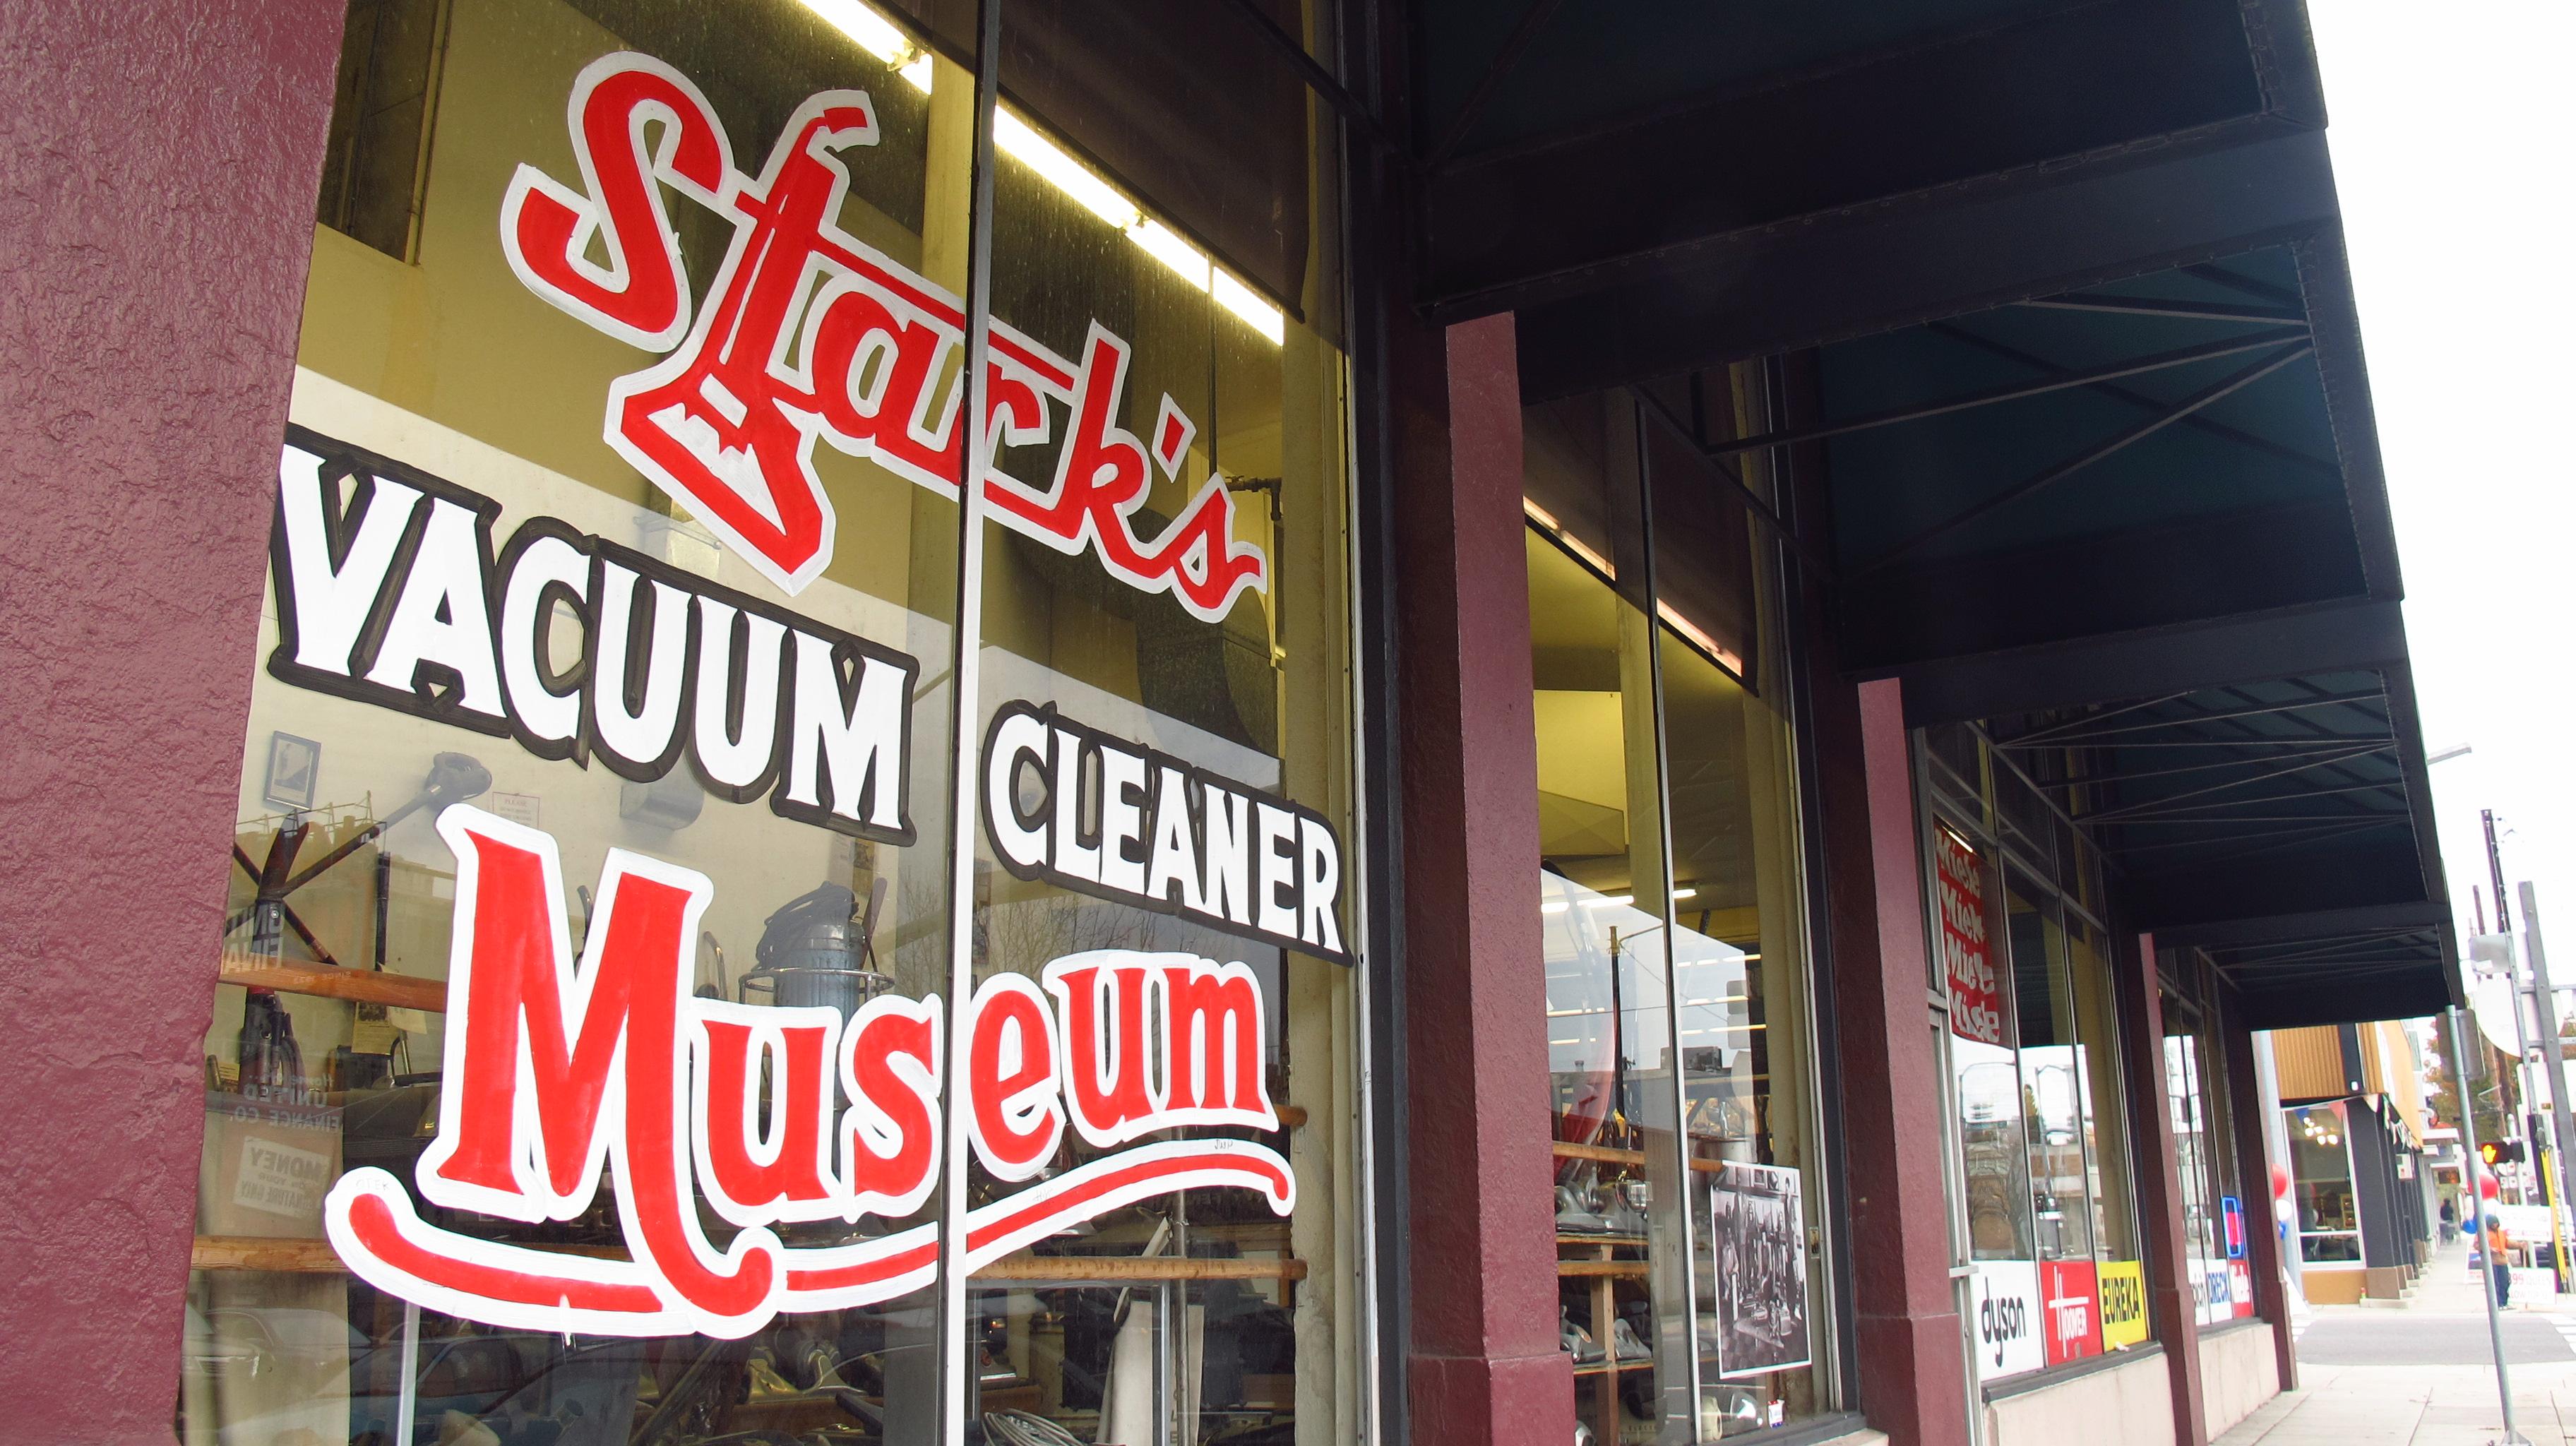 Outside Starks Vacuum Museum